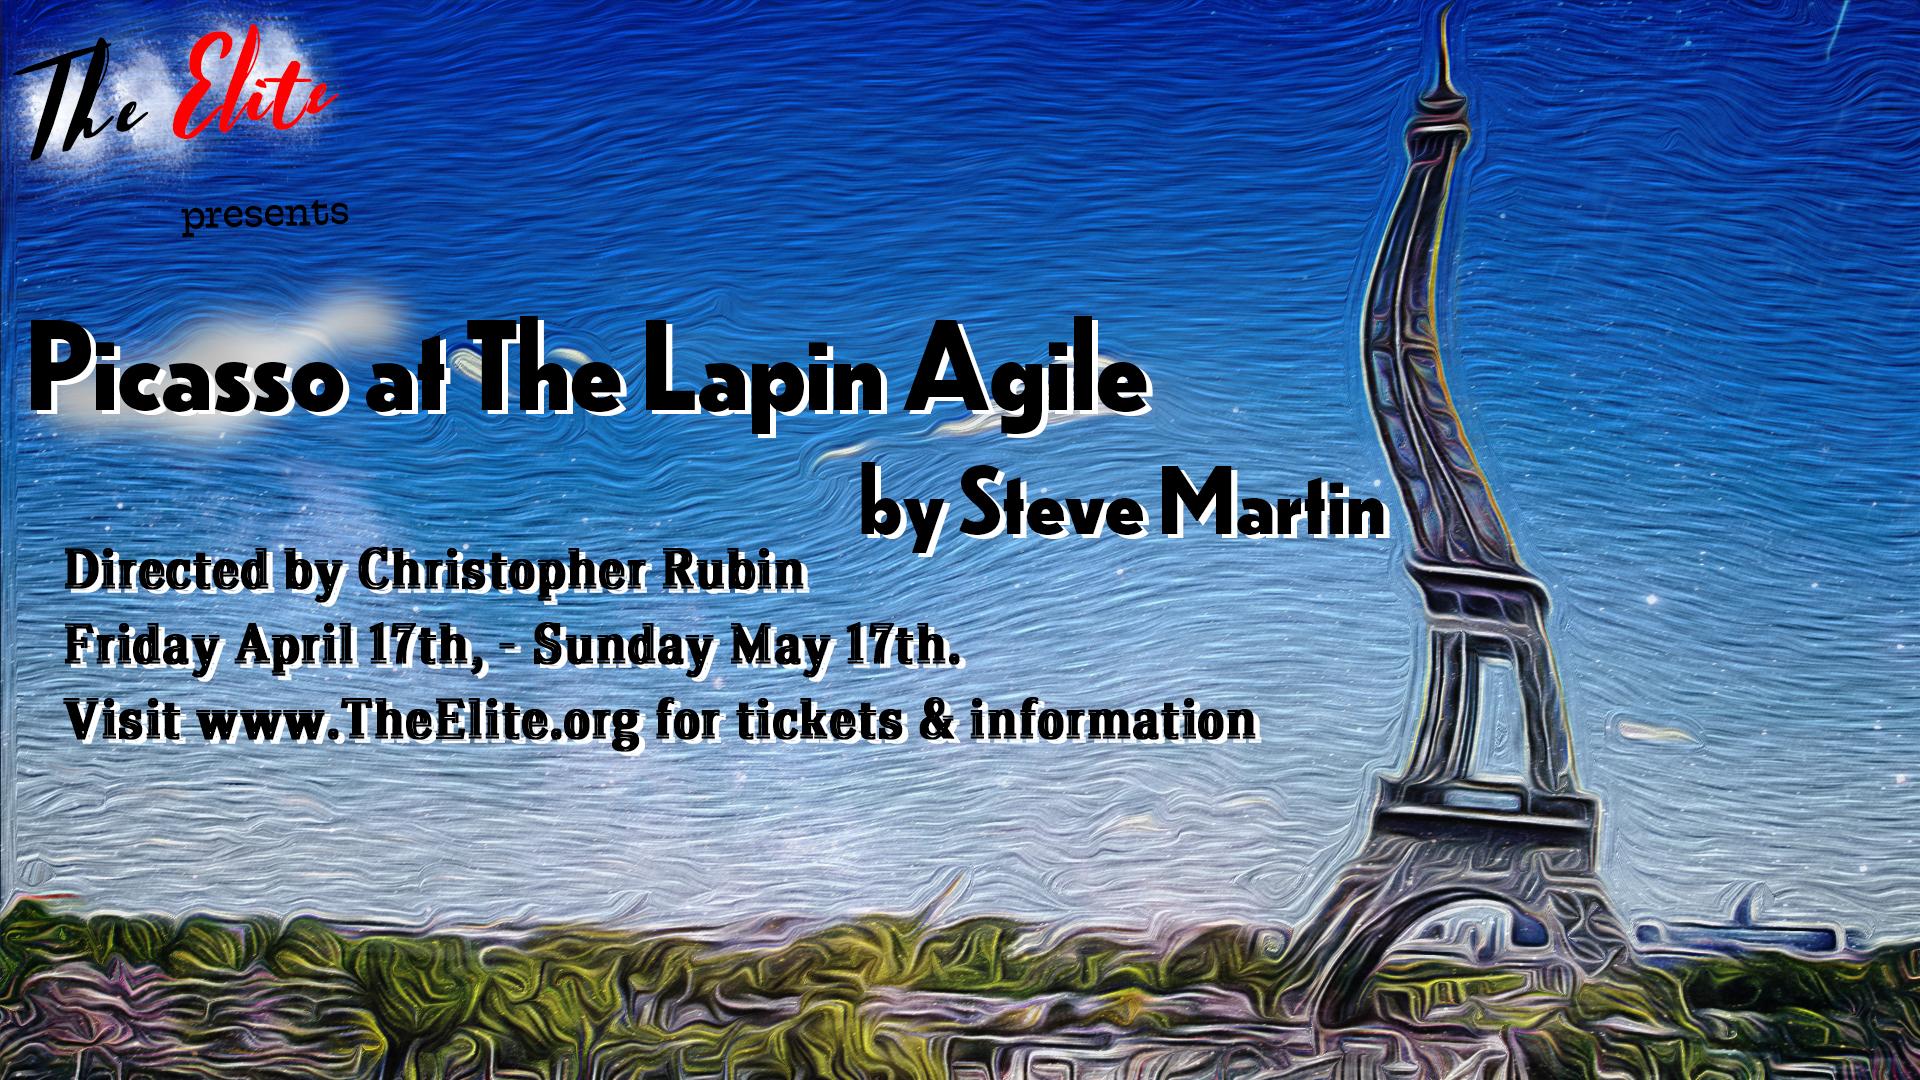 Elite Theatre Company Presents Picasso at the Lapin Agile by Steve Martin